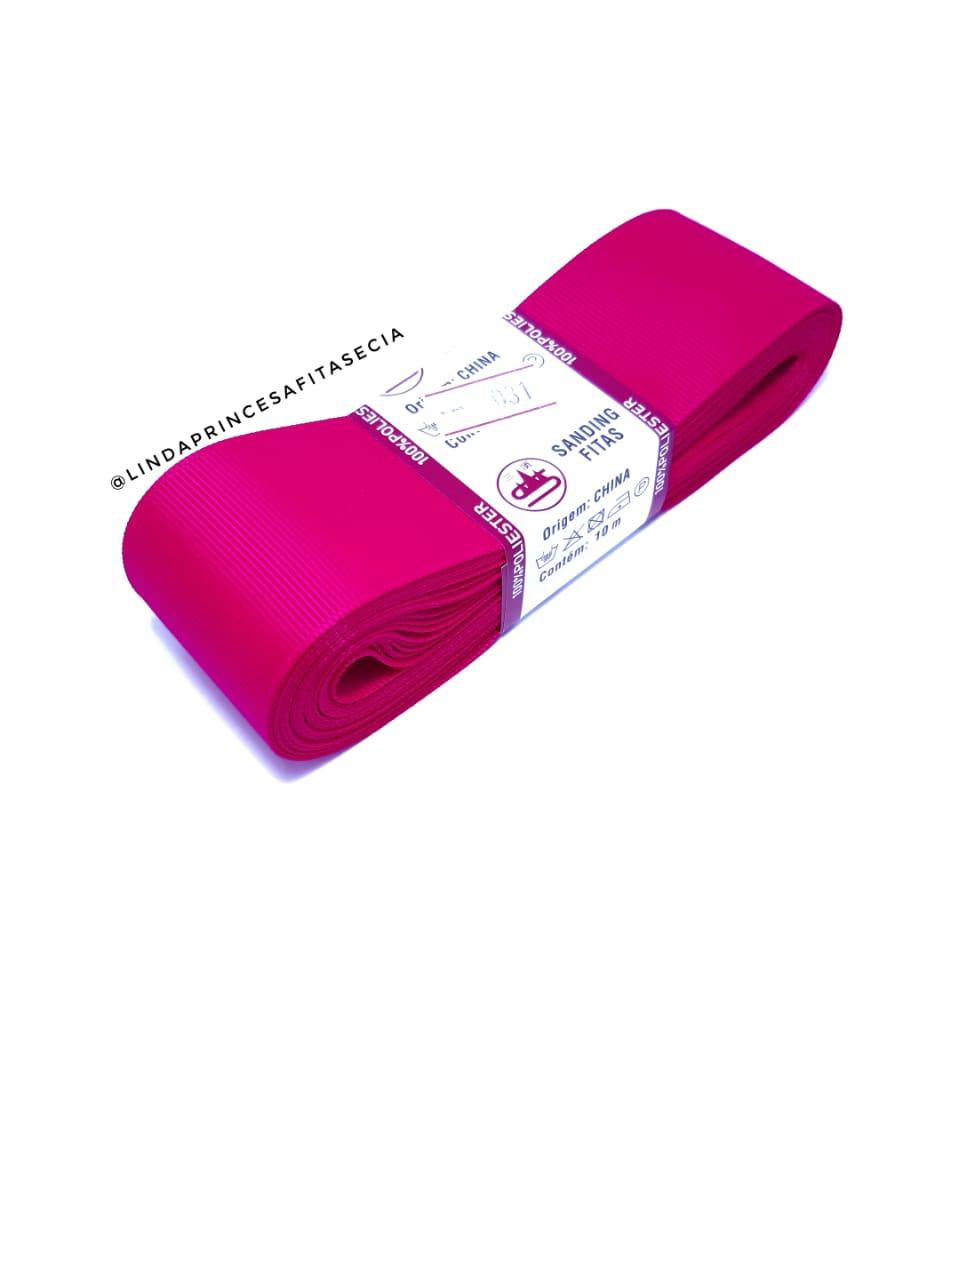 FITA SANDING 38 mm - Cor: 031 Pink.